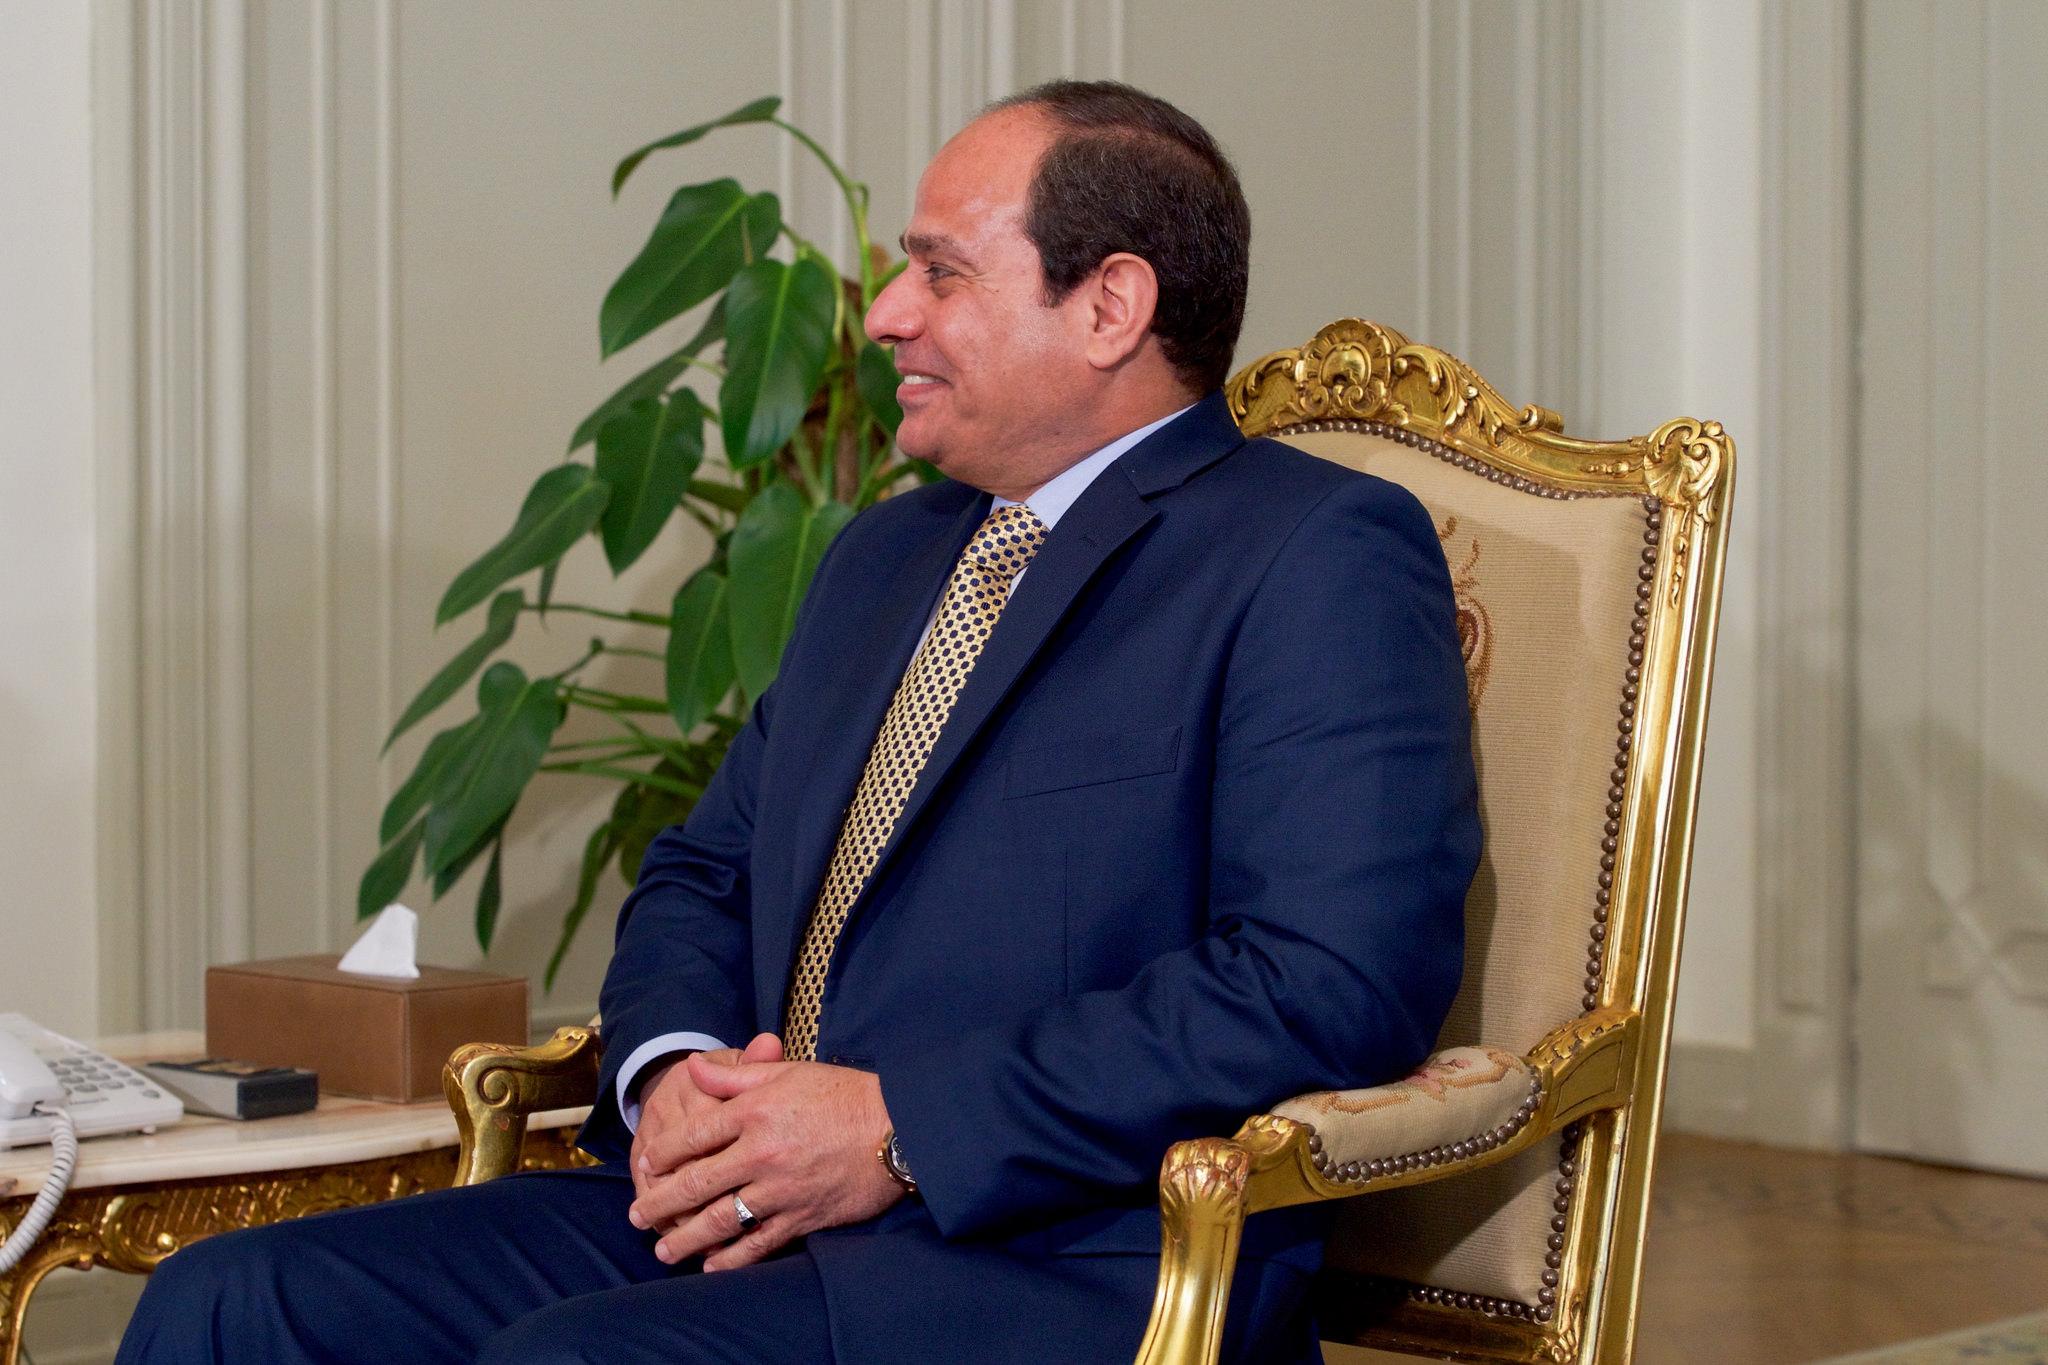 egipetskiy-president-al_sisi__-26539495495